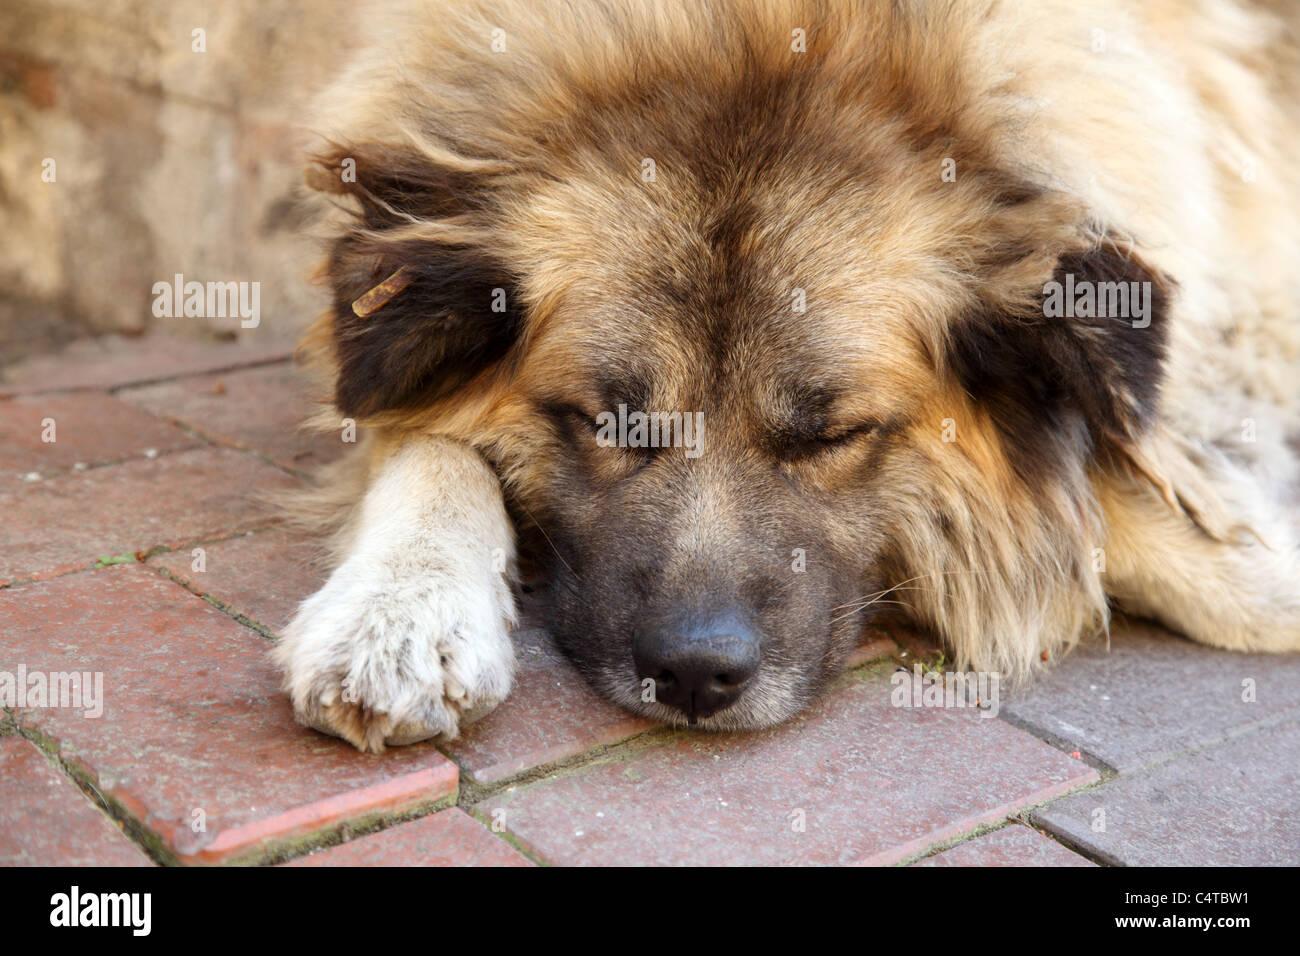 Cute dog sleeping on the sidewalk - Stock Image